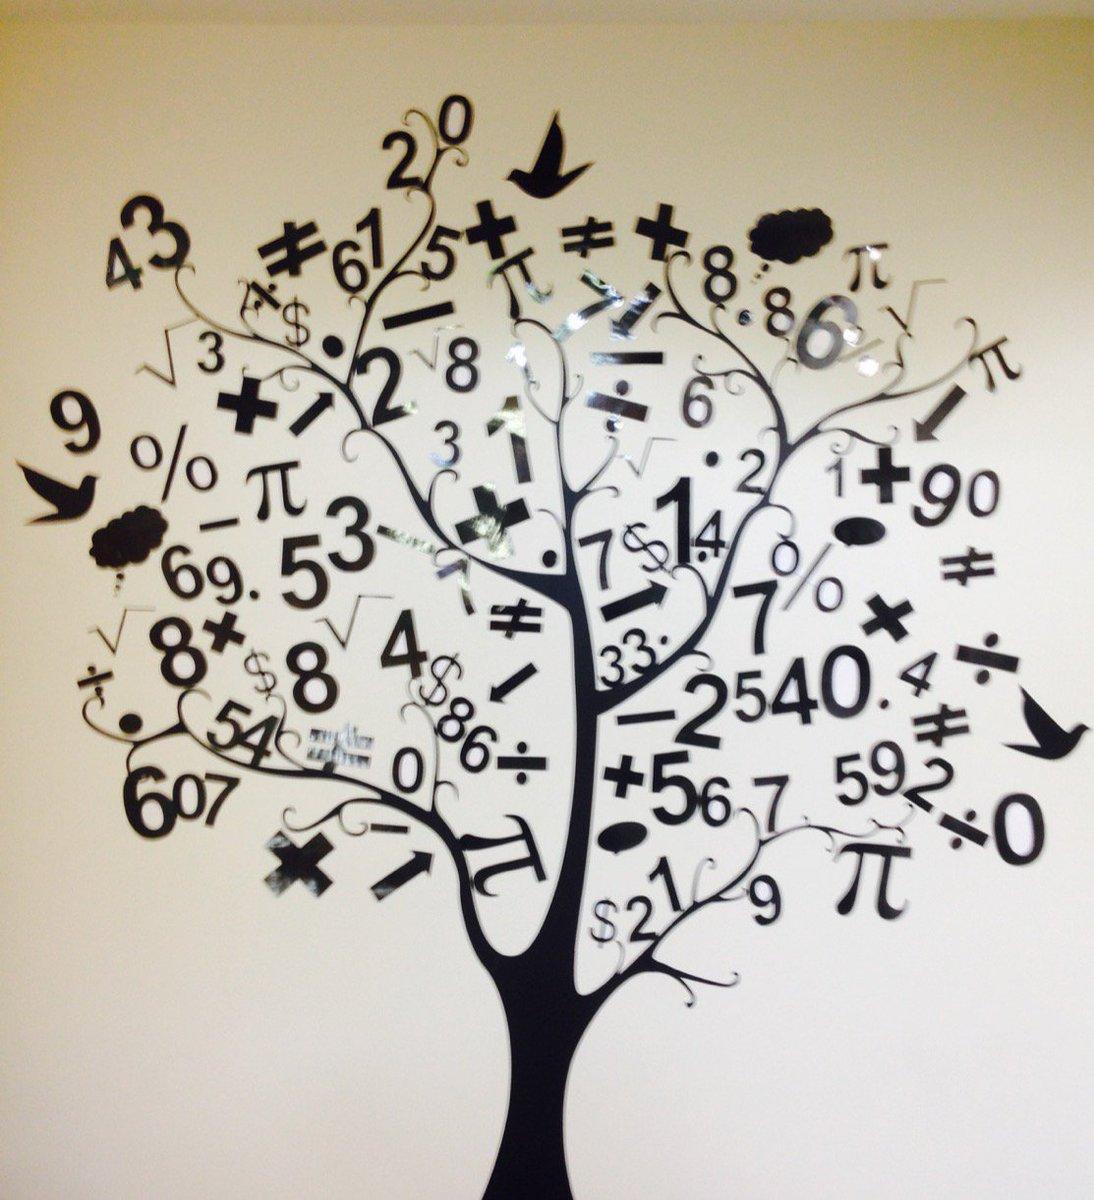 dyscalculia tree